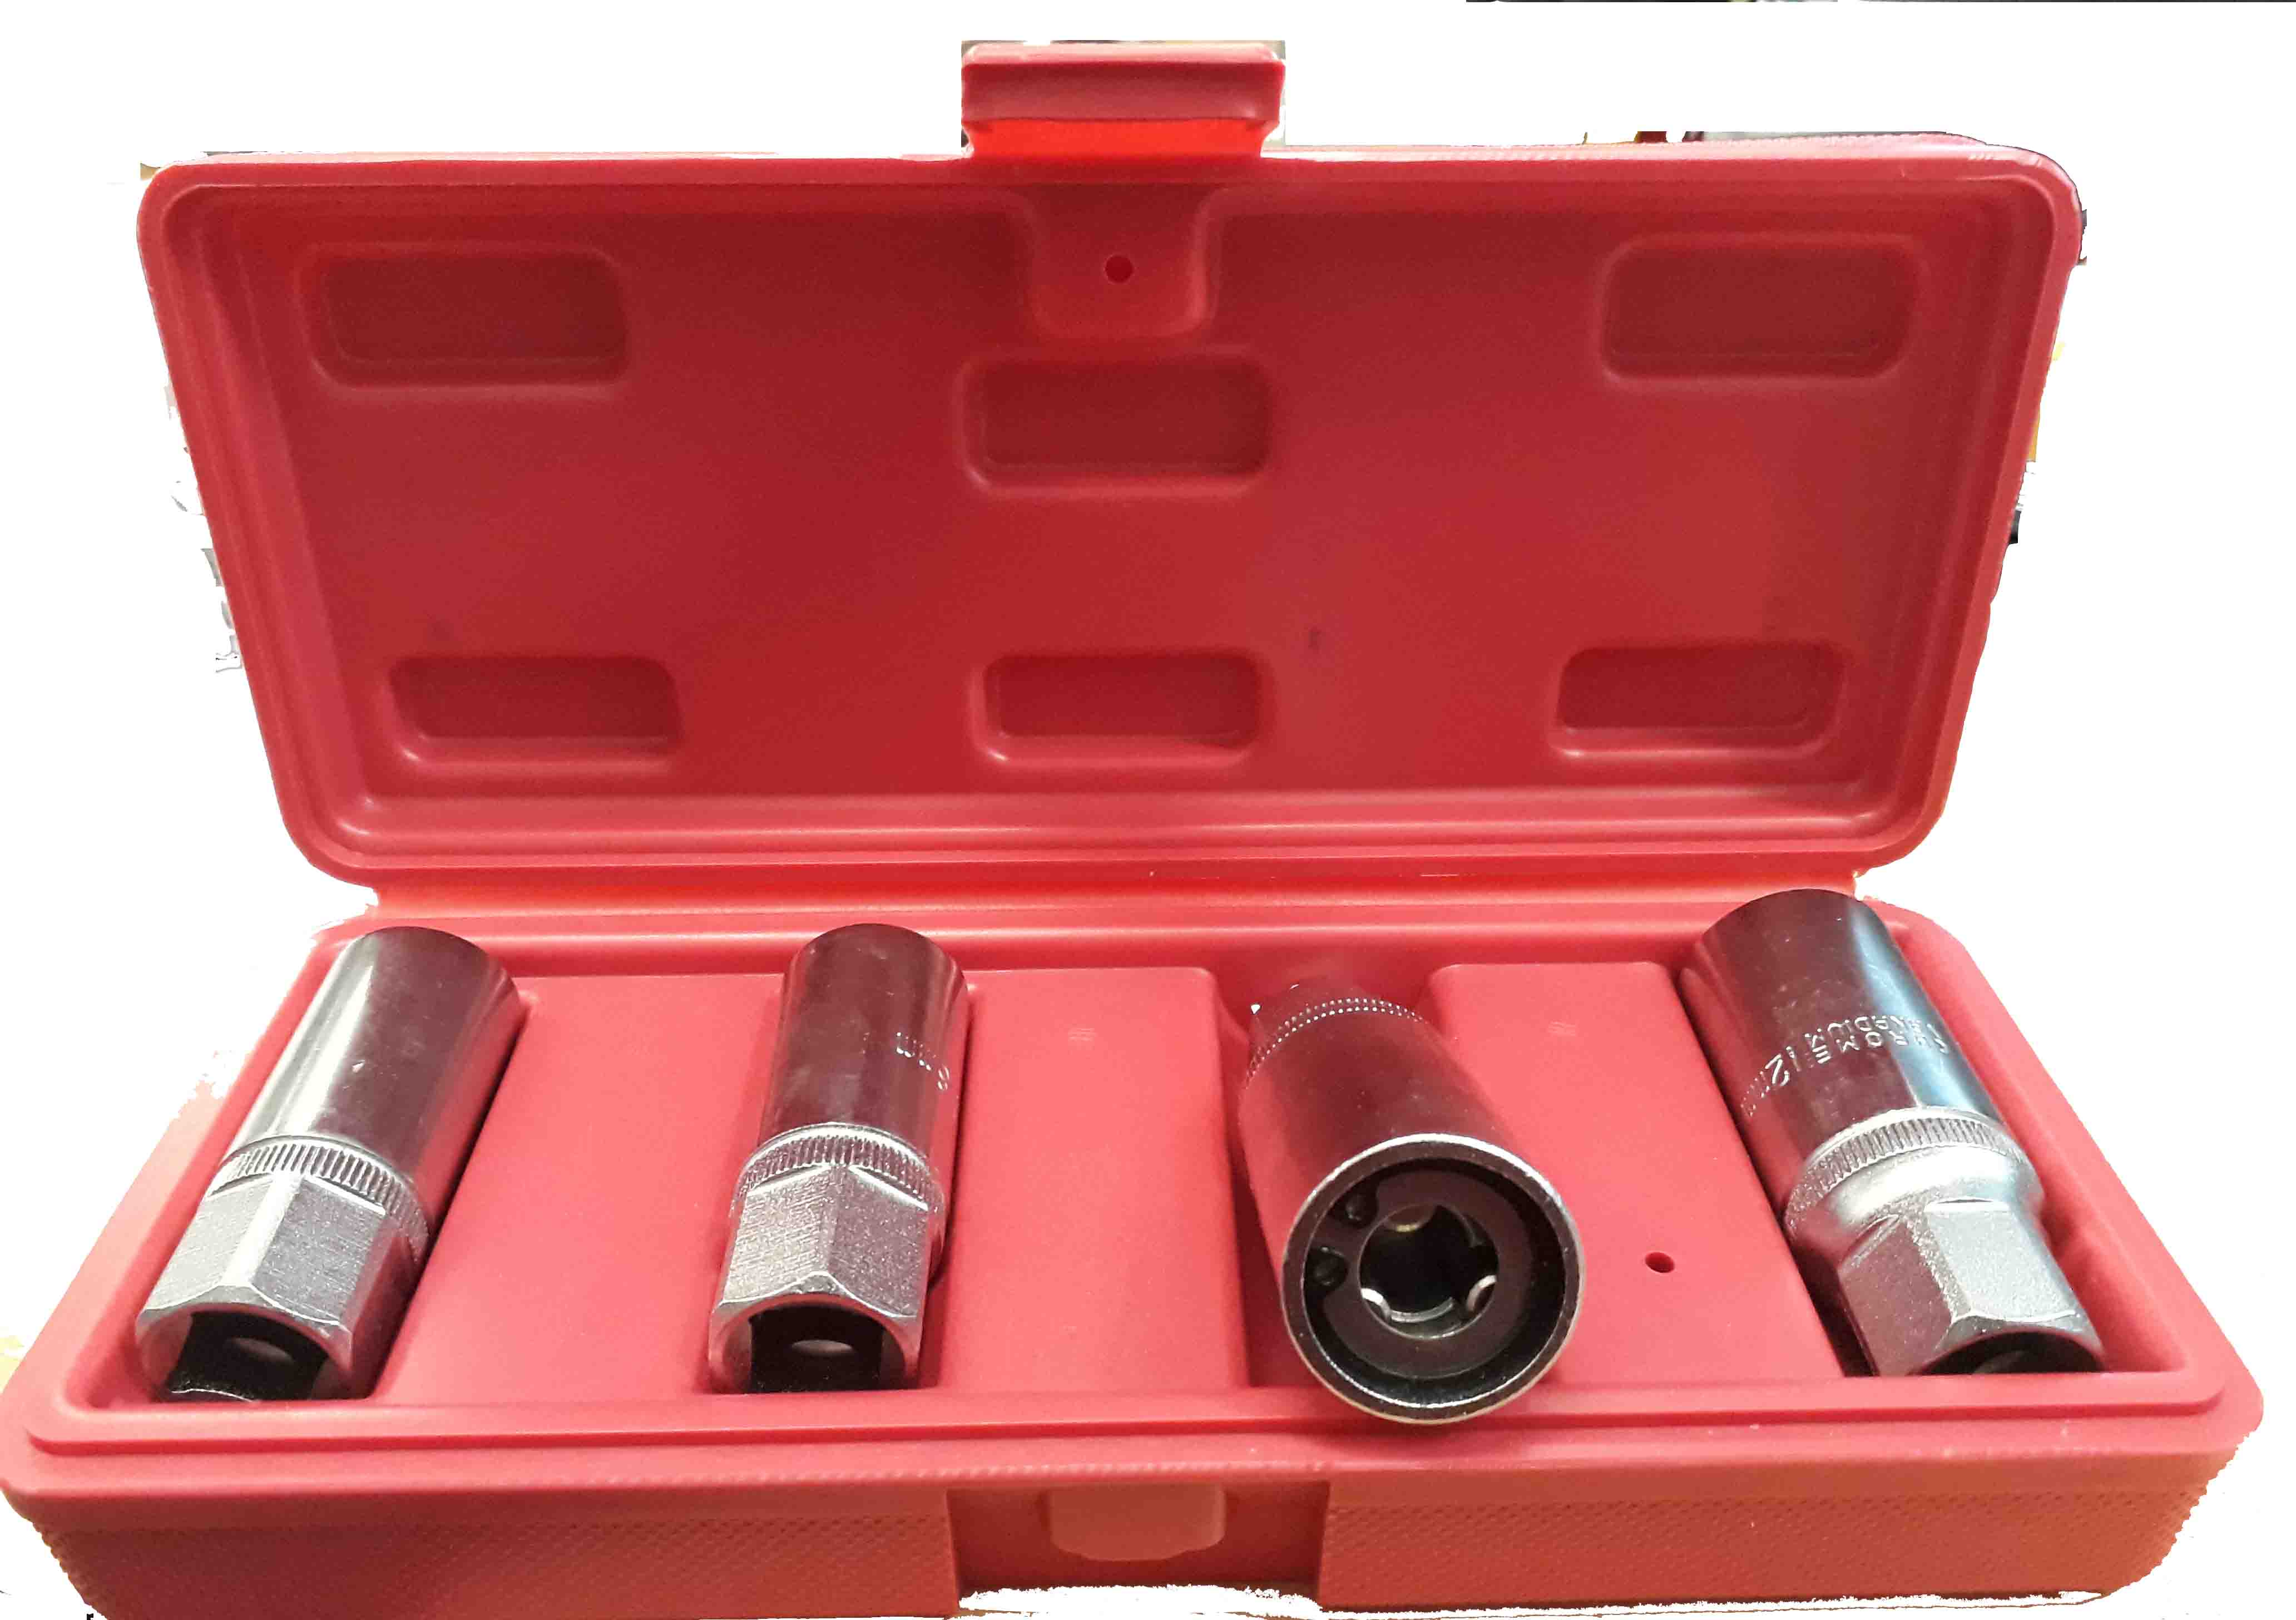 Vytahovač svorníků-šteftů sada 4 kusy 6-12 mm